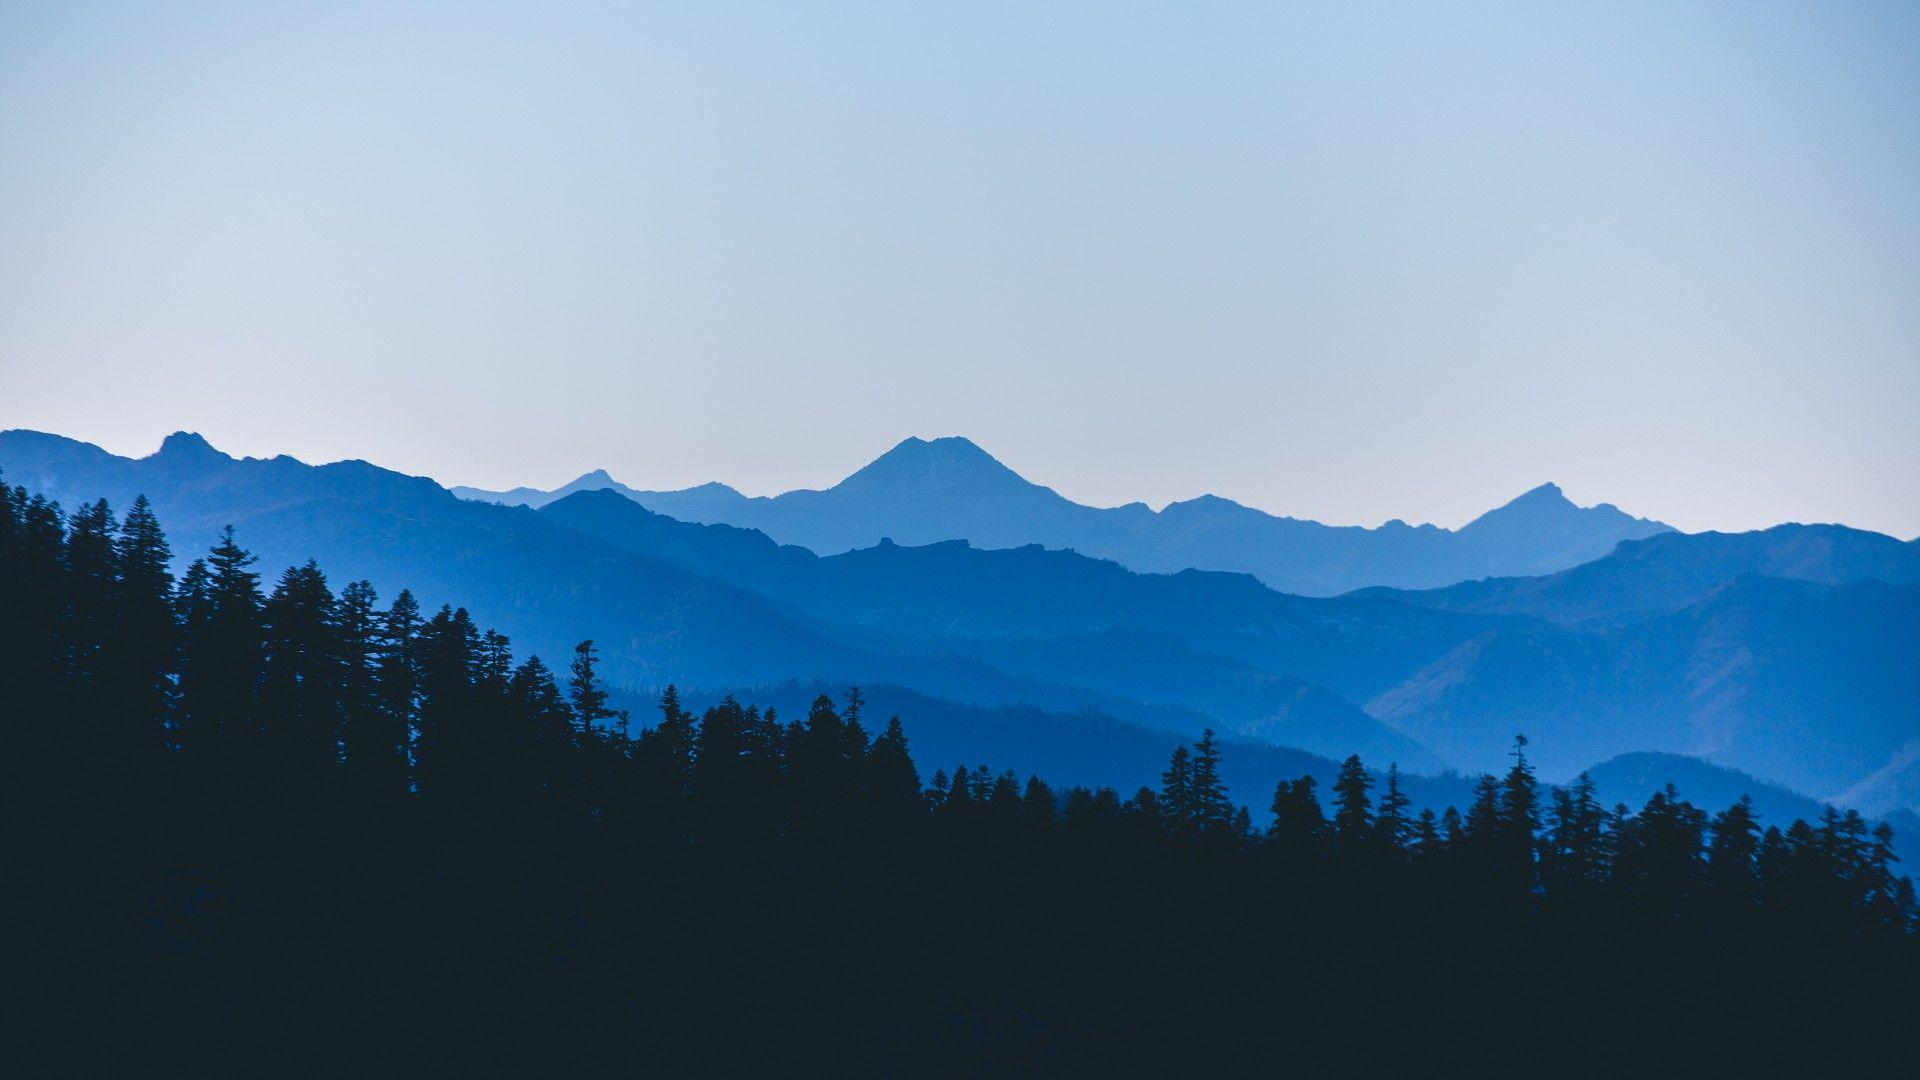 Free Mountain Vector image